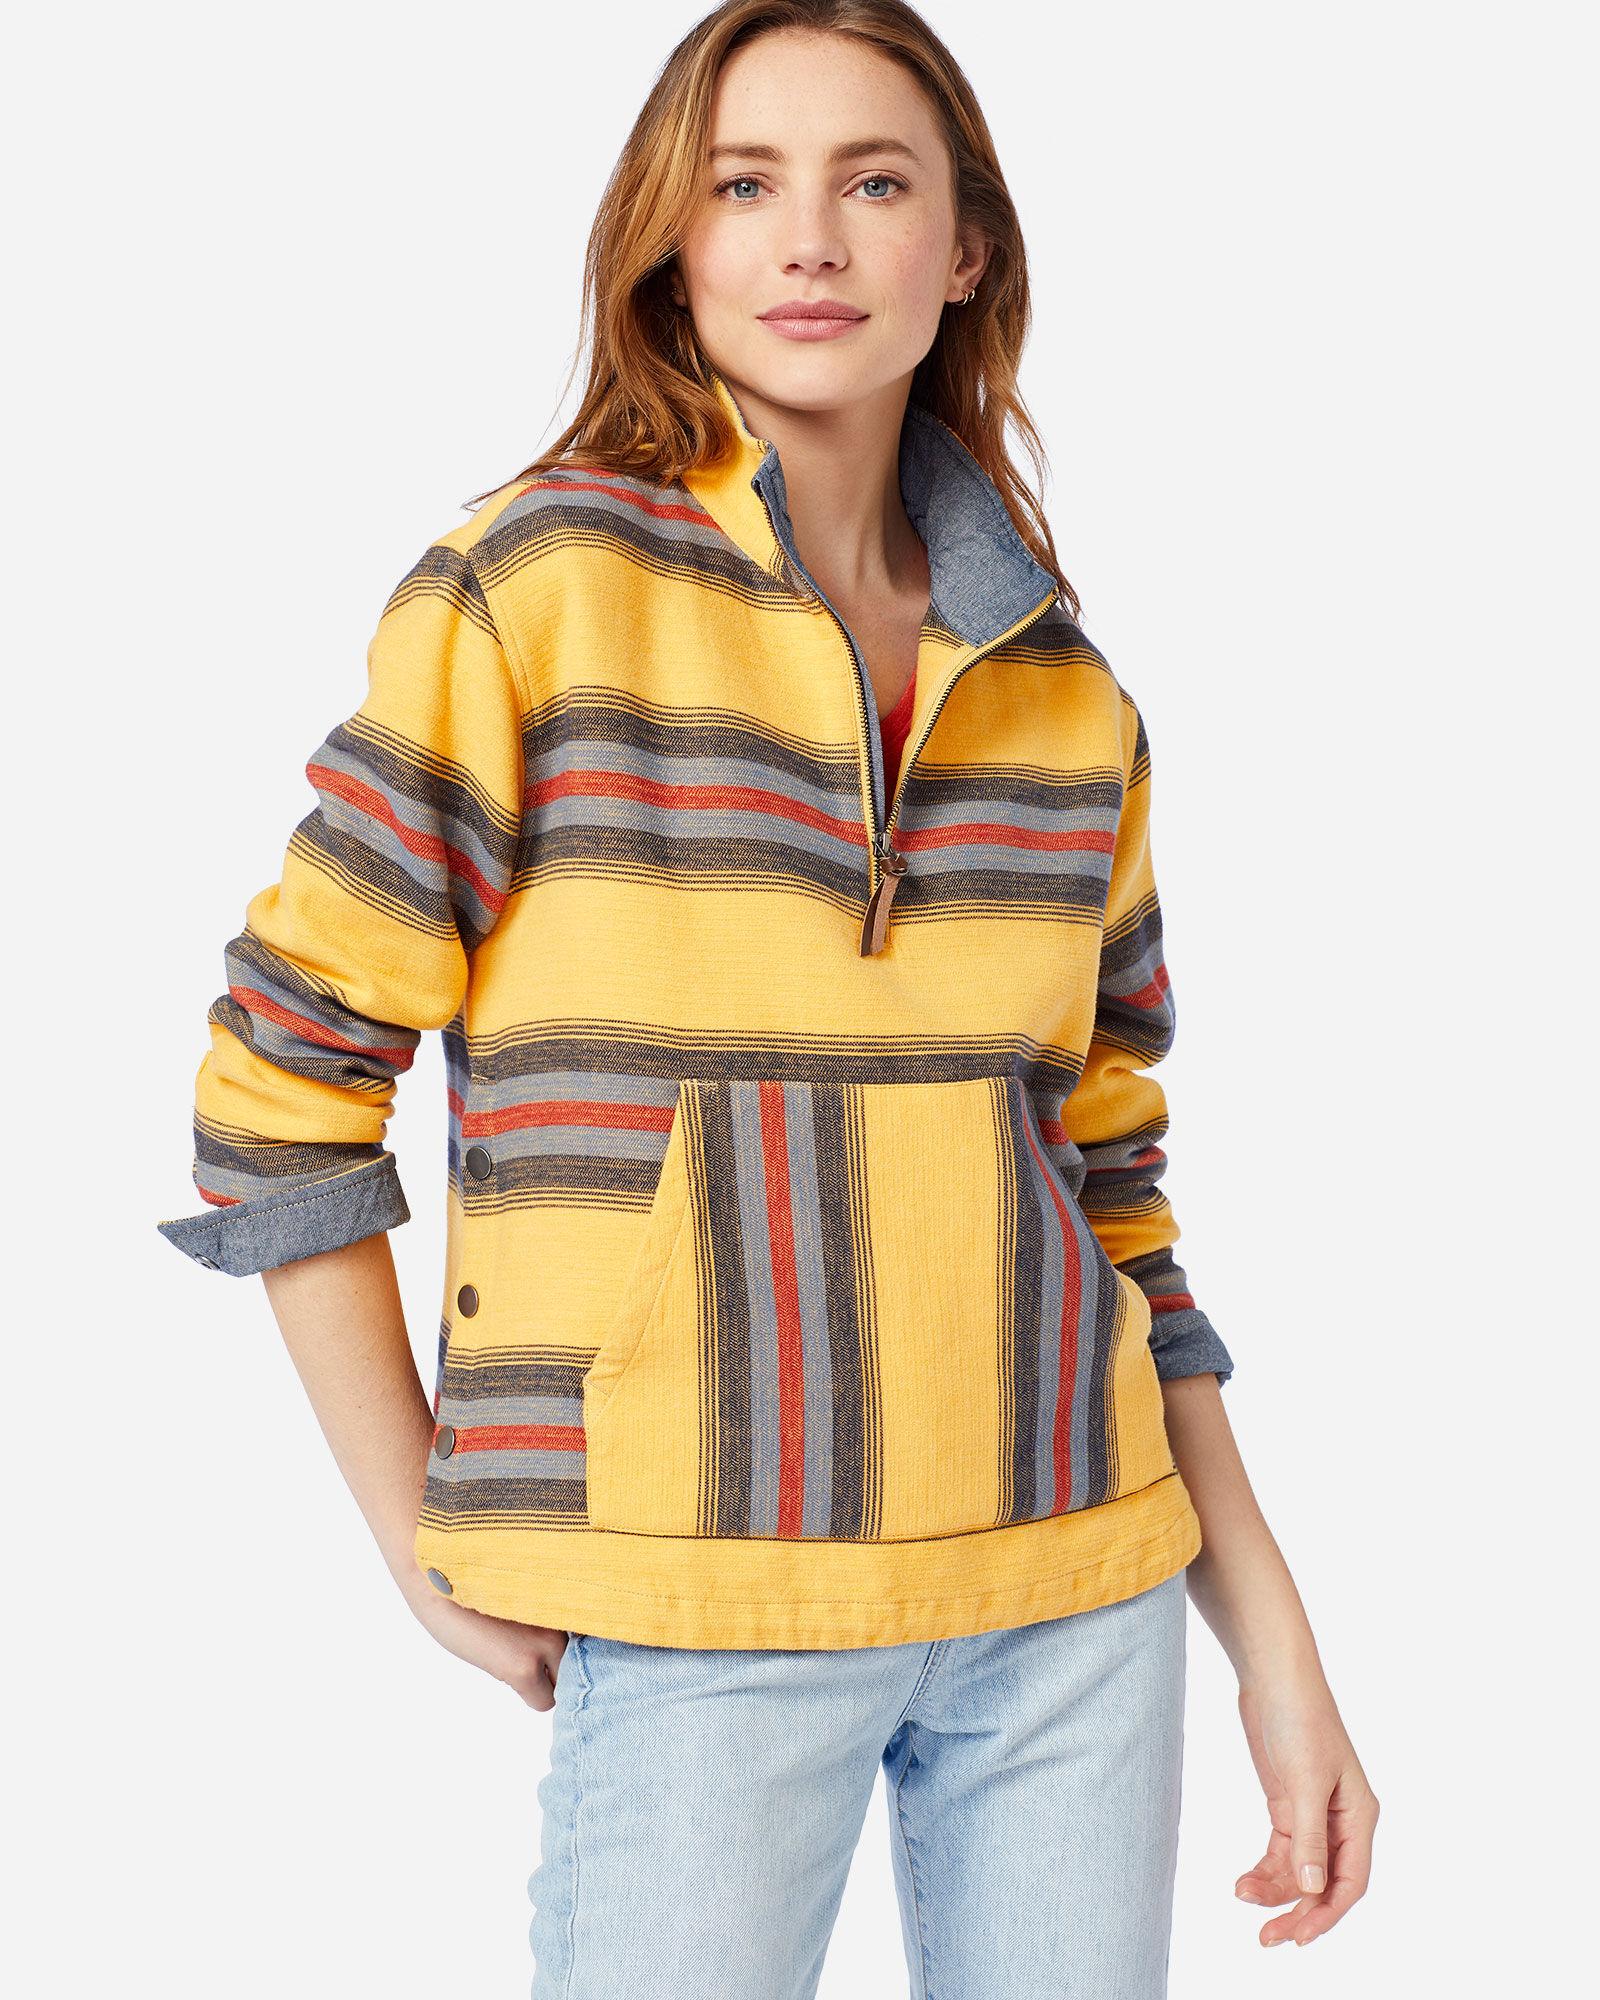 Half Zip Pullover from Pendleton